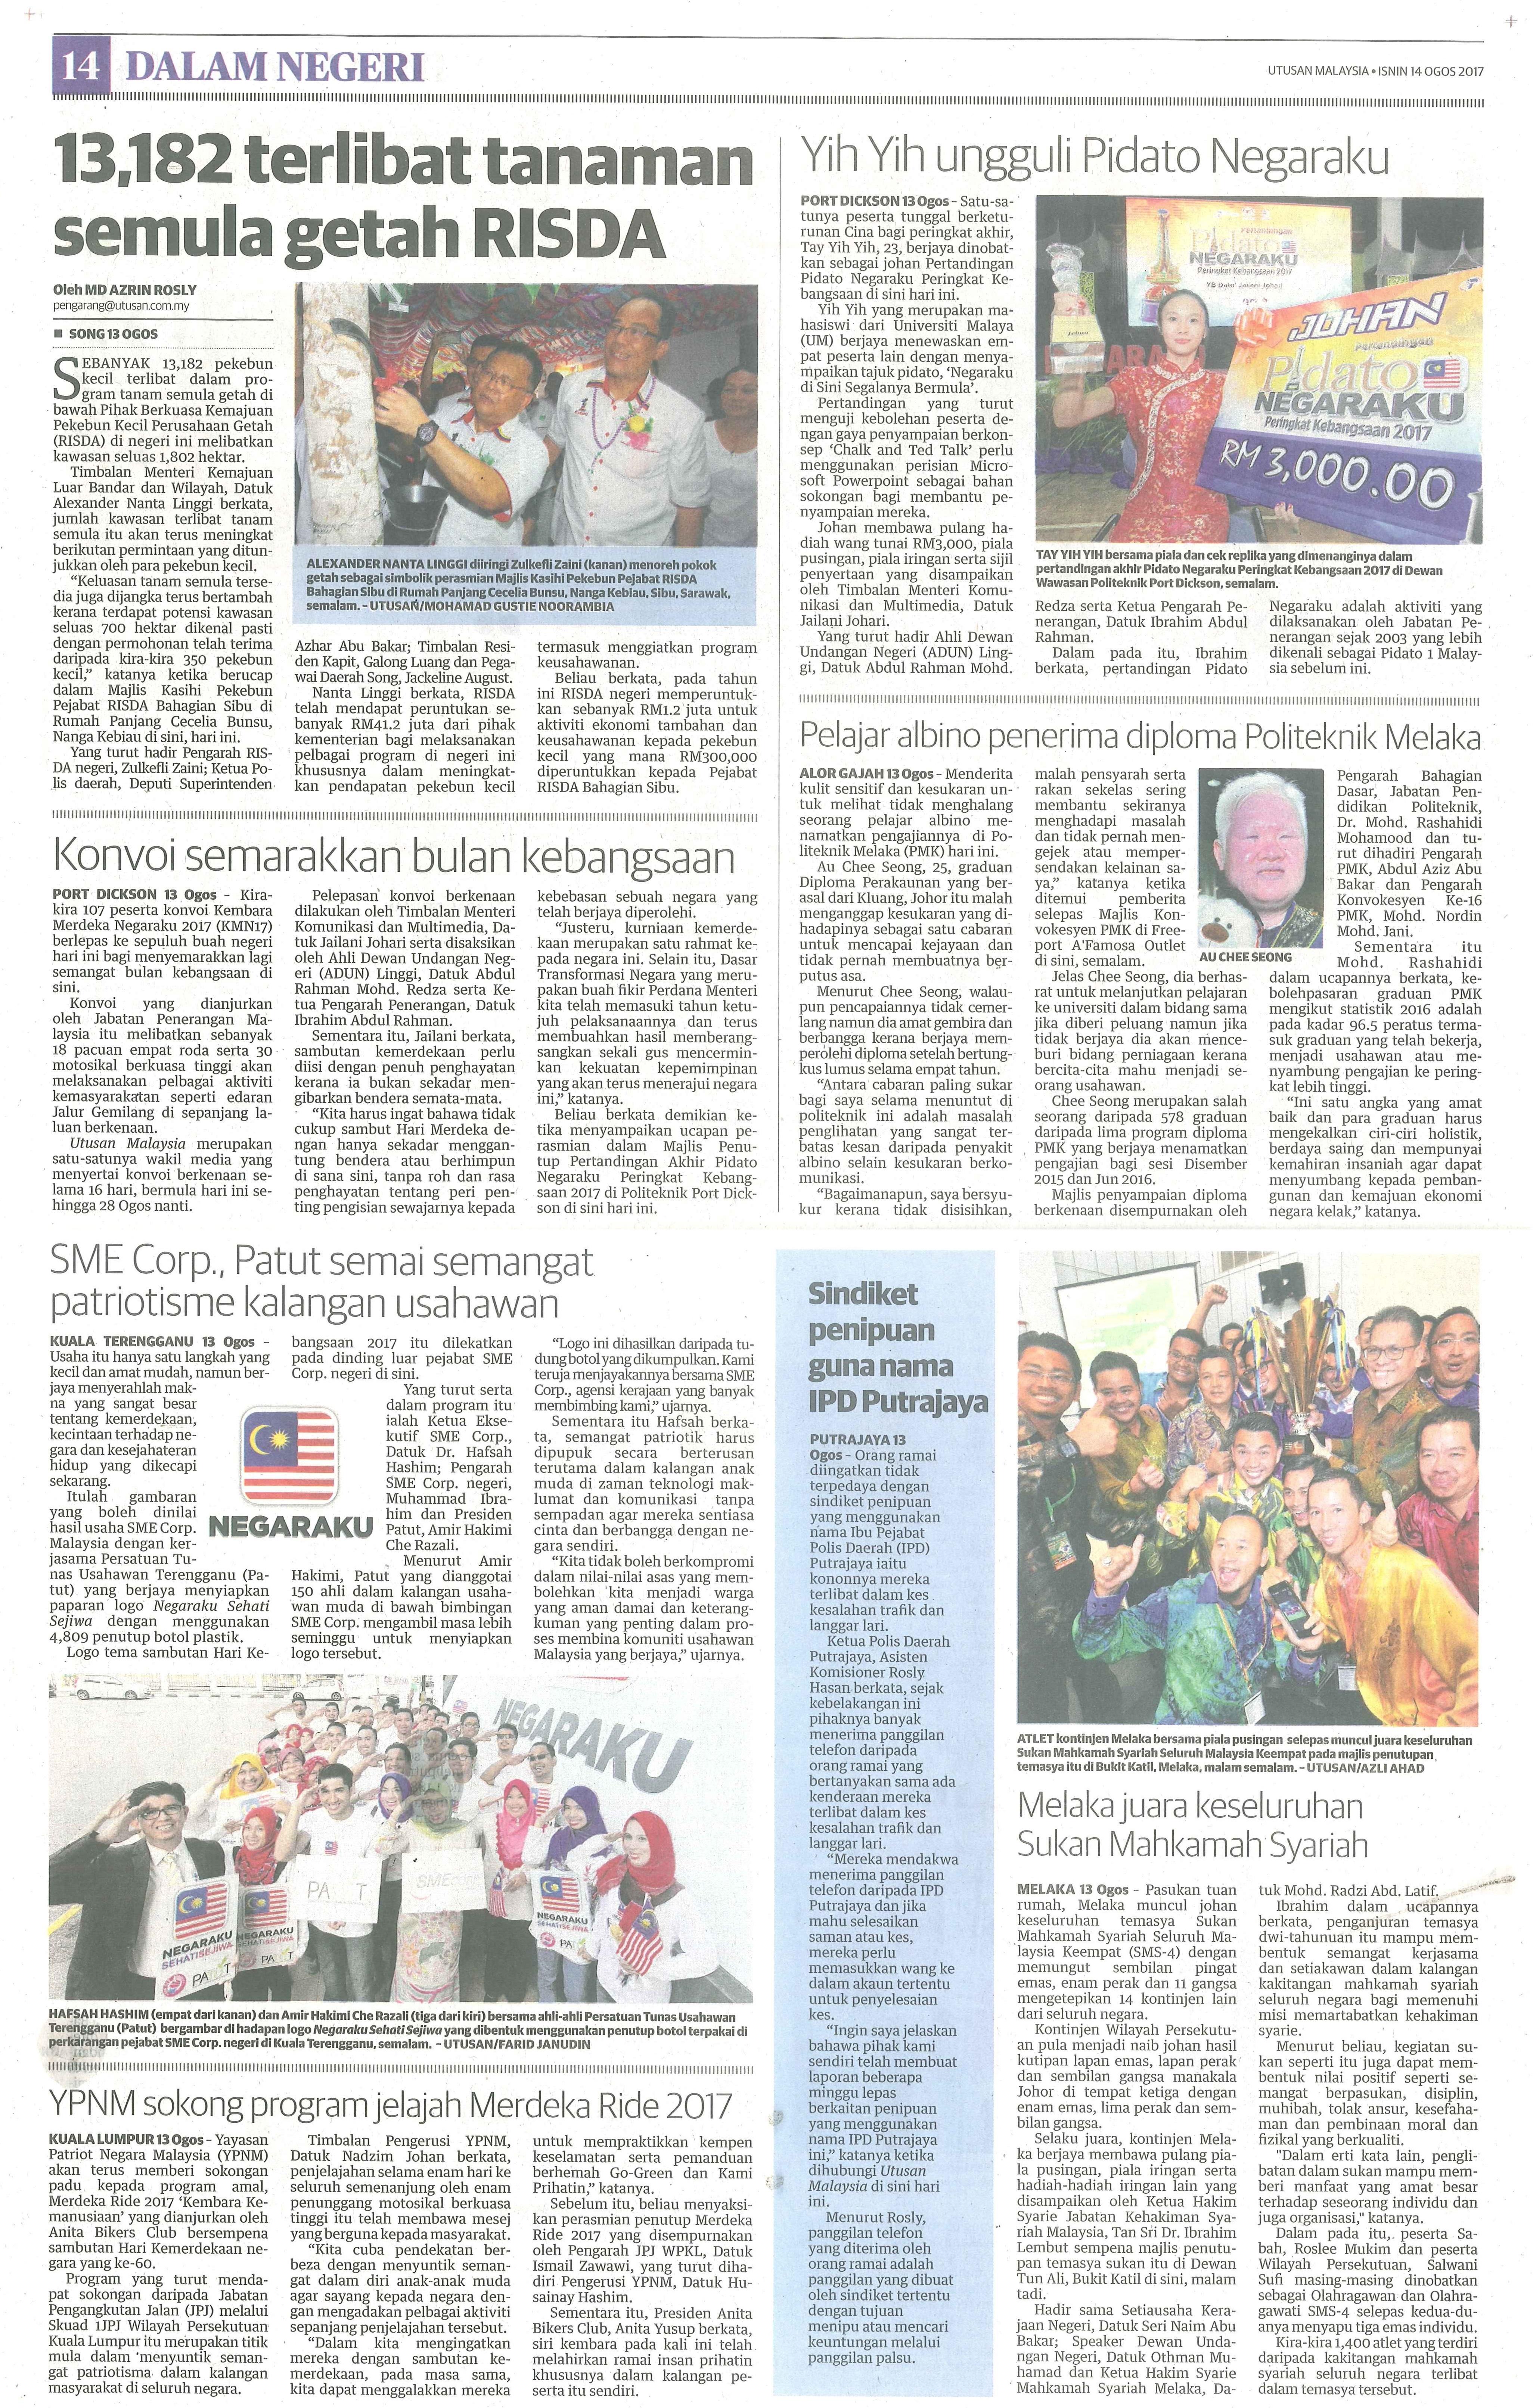 utusan malaysia 14.8.2017